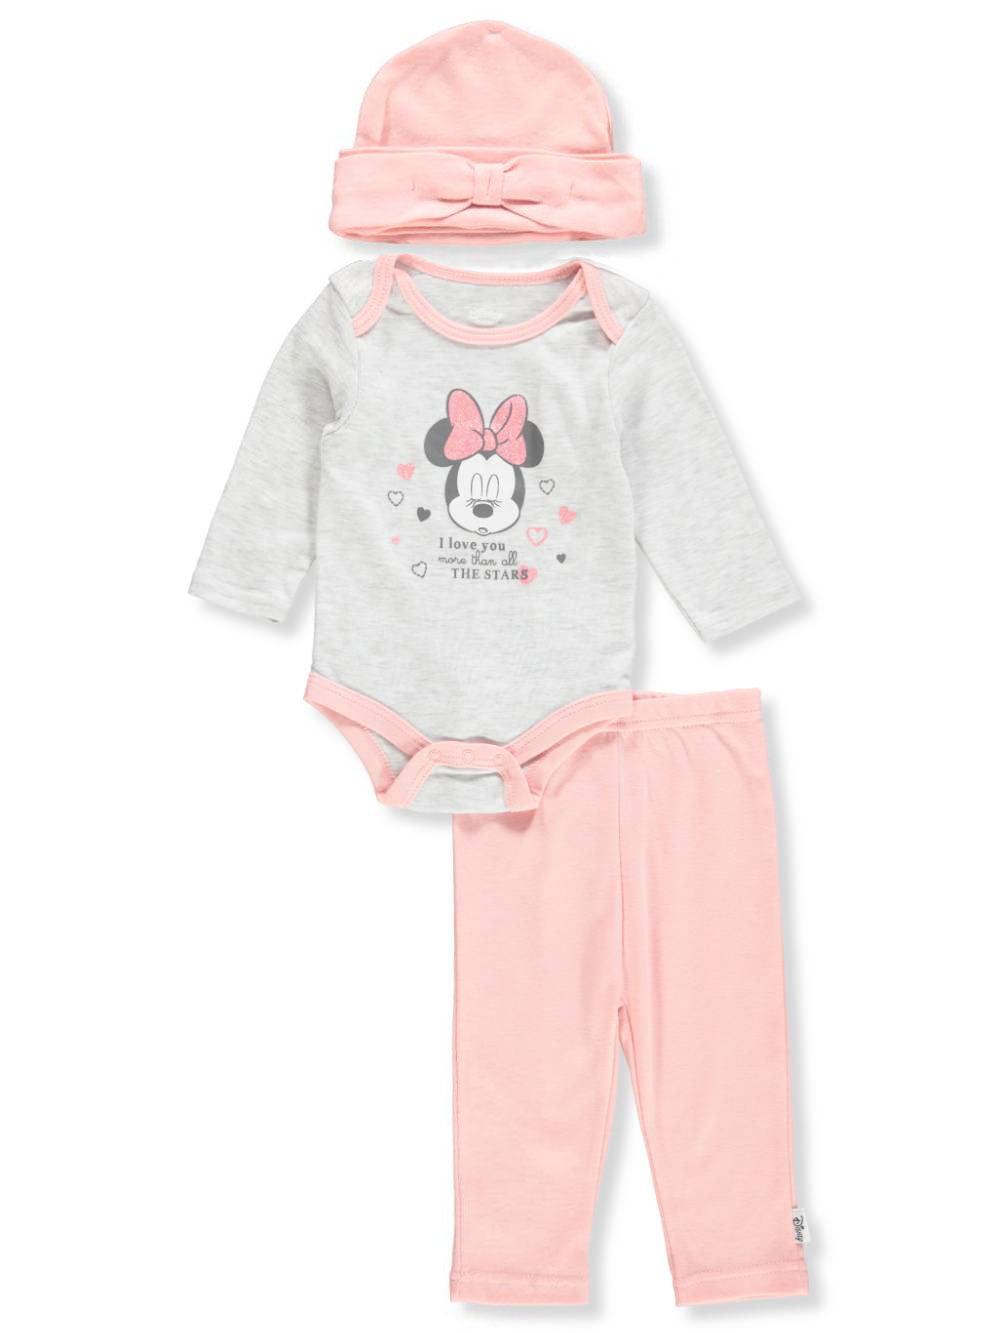 Disney Minnie Mouse Baby Girls' 3-Piece Layette Set